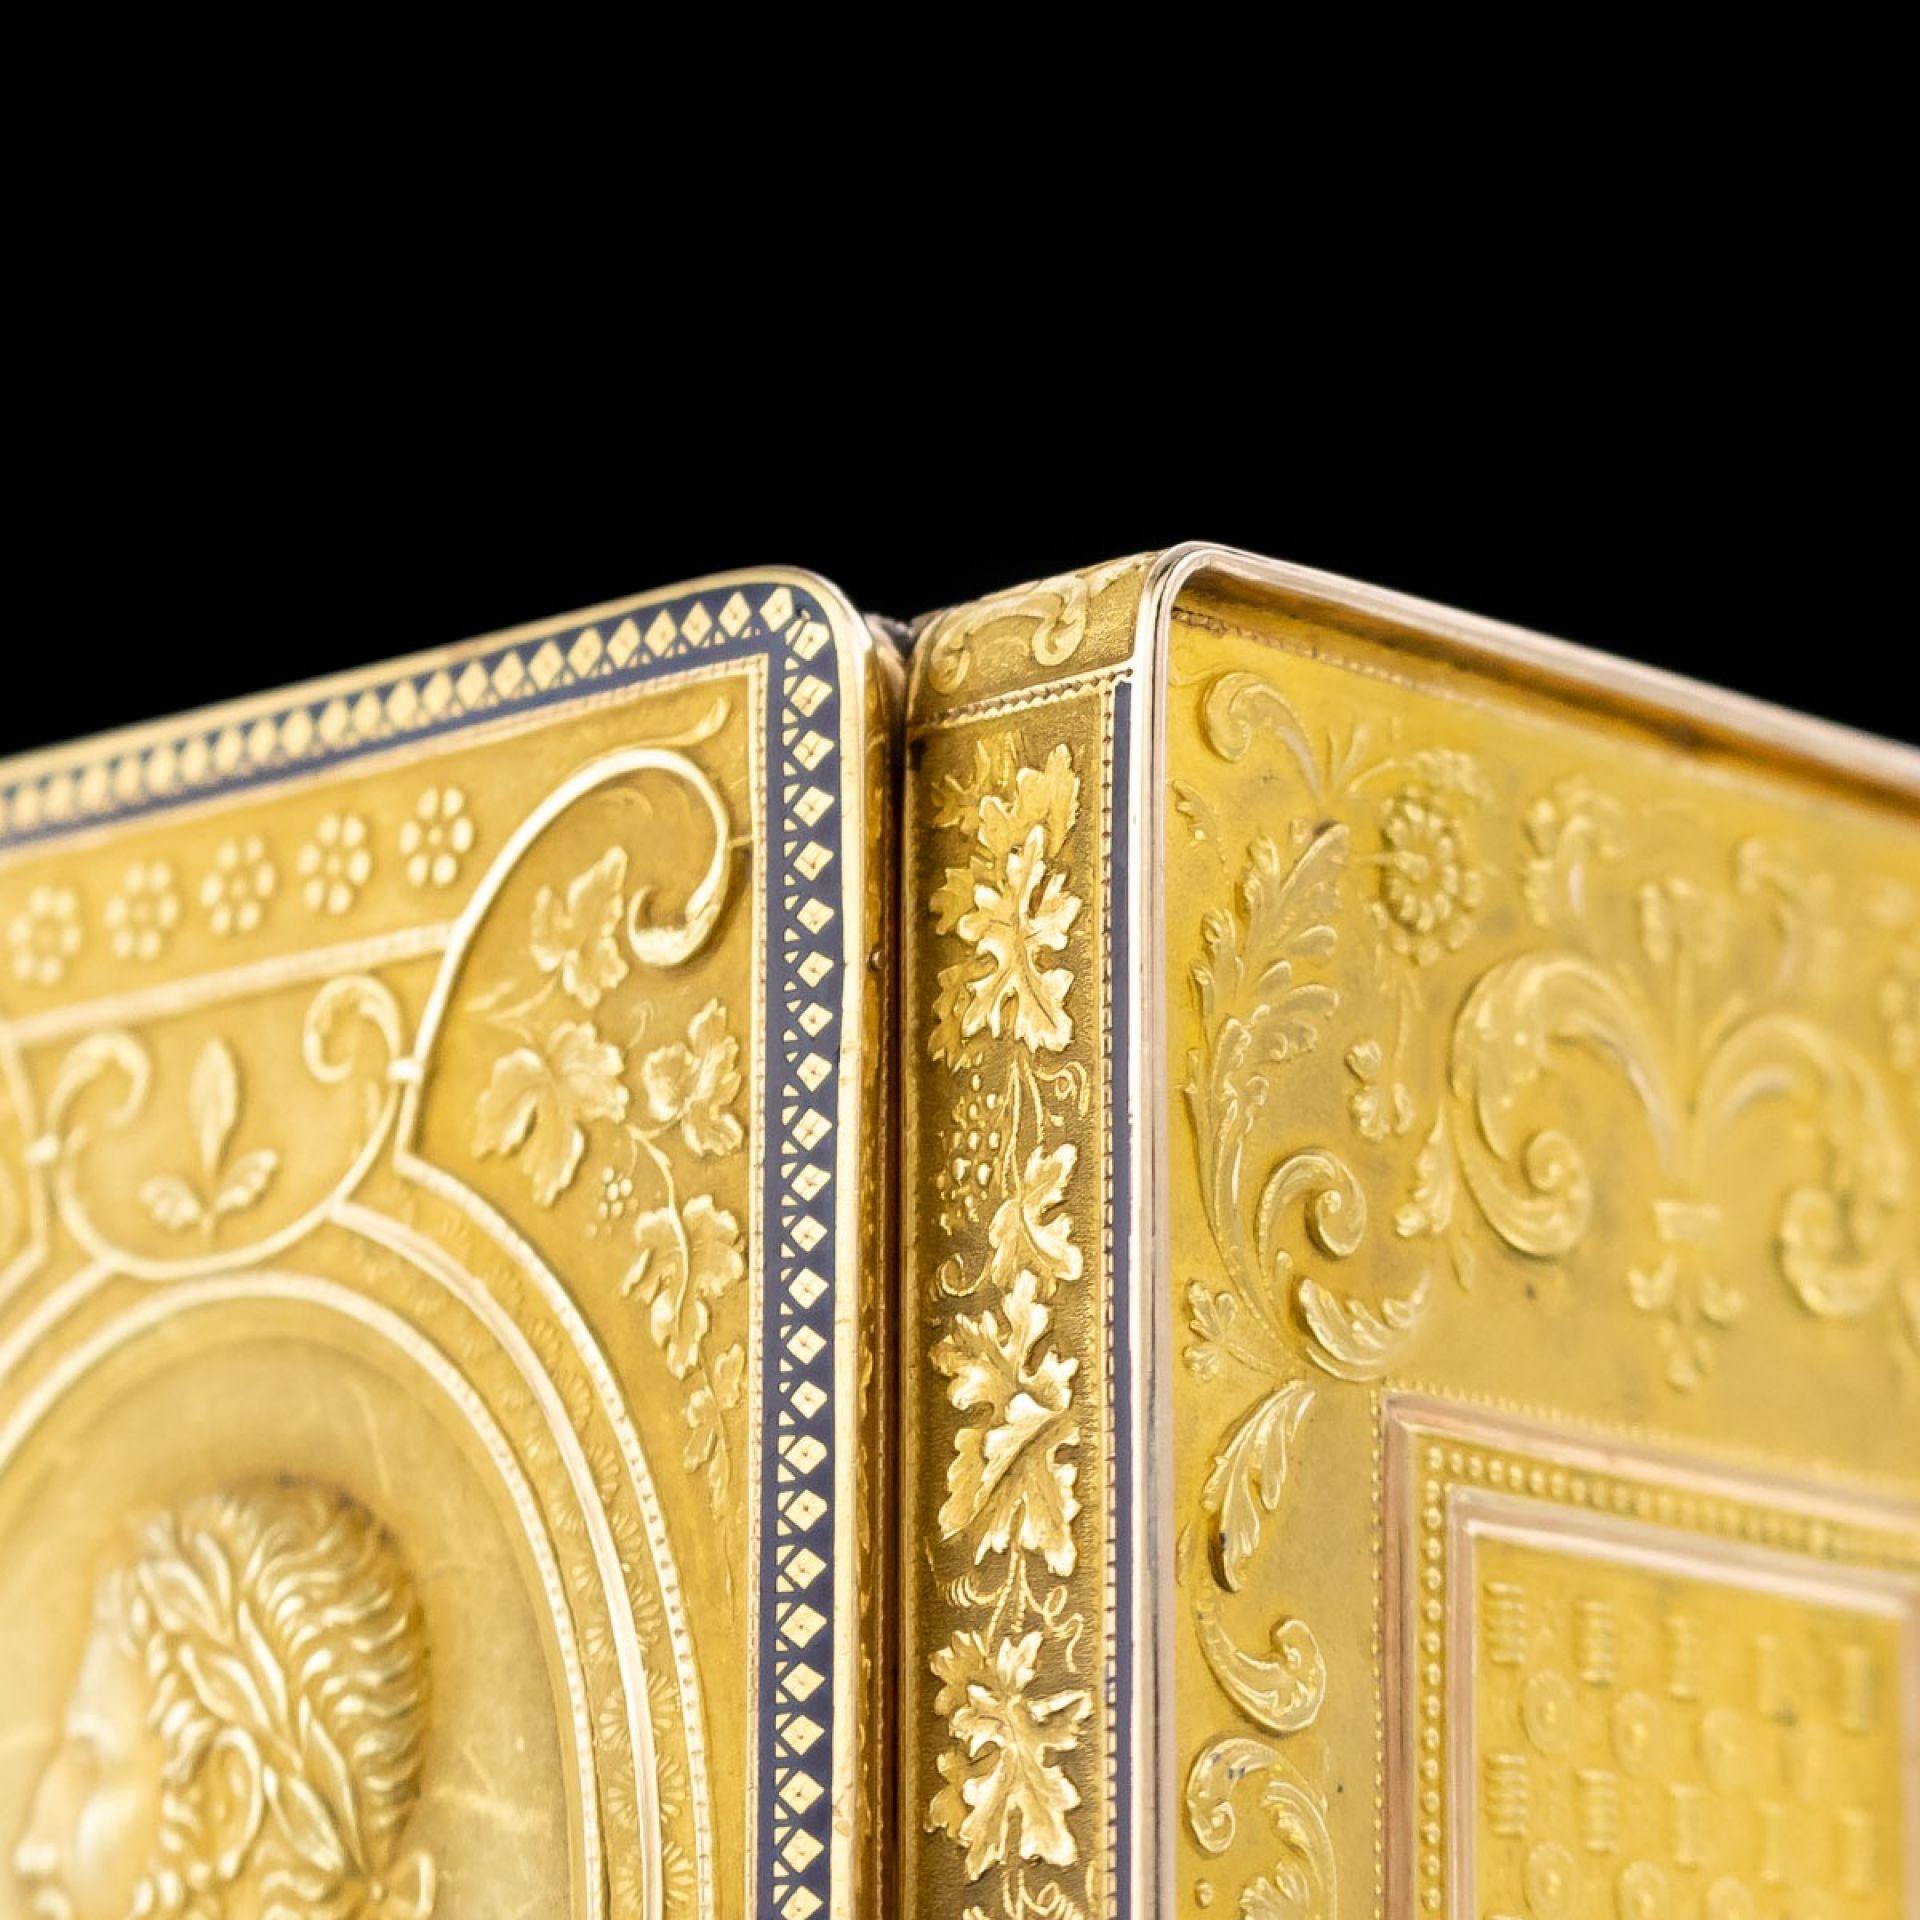 ANTIQUE 19thC SWISS 18k GOLD & ENAMEL SNUFF BOX, GENEVA c.1800